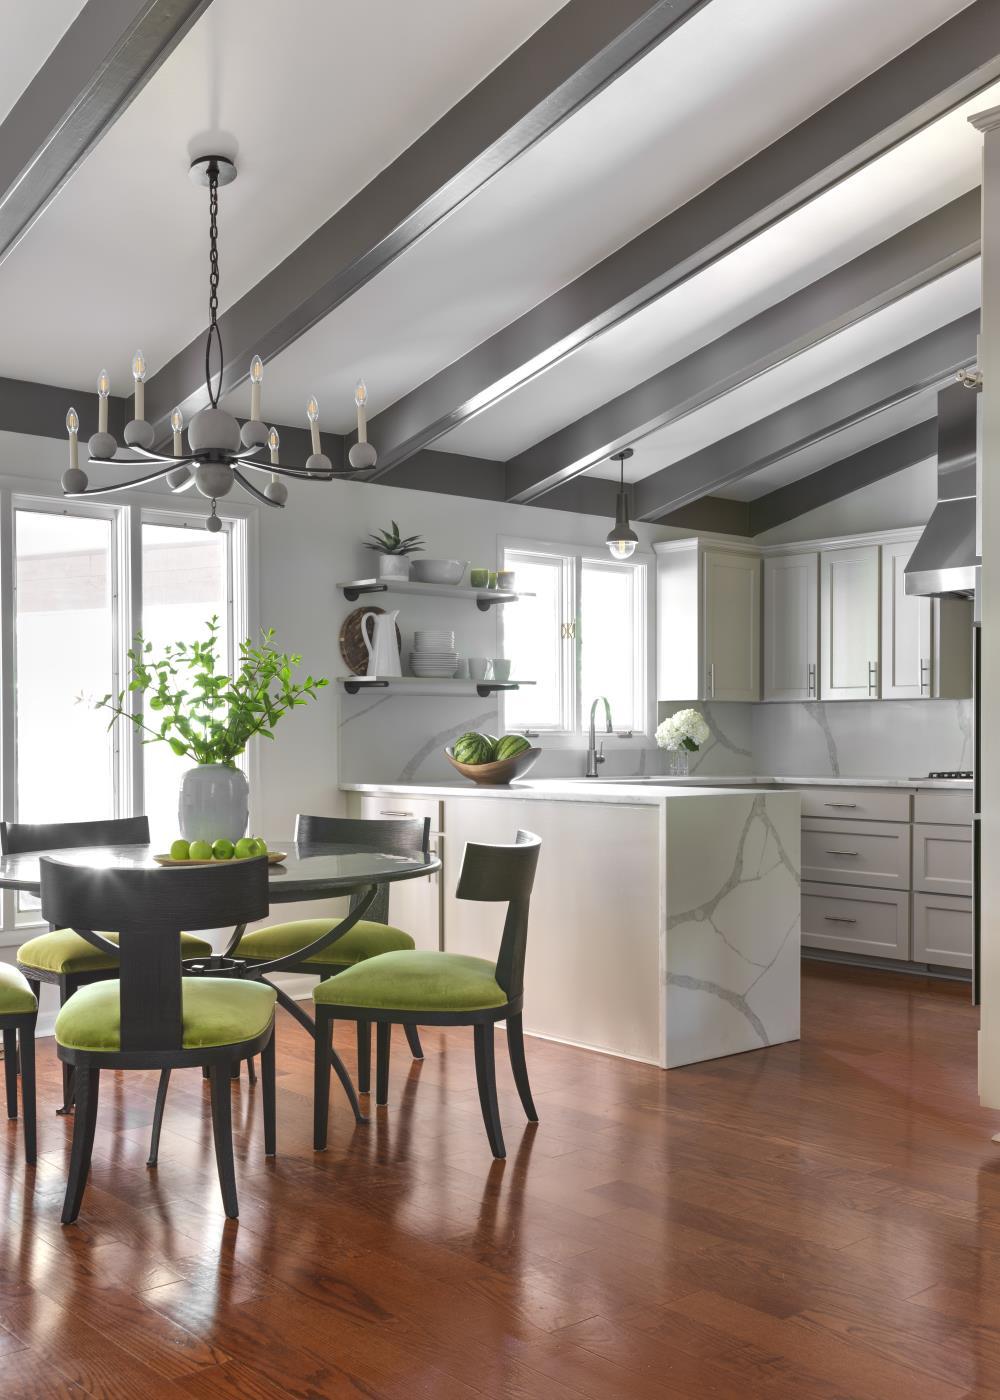 Interior-design-arkansas-midcentury-modern-Krista-Lewis-007